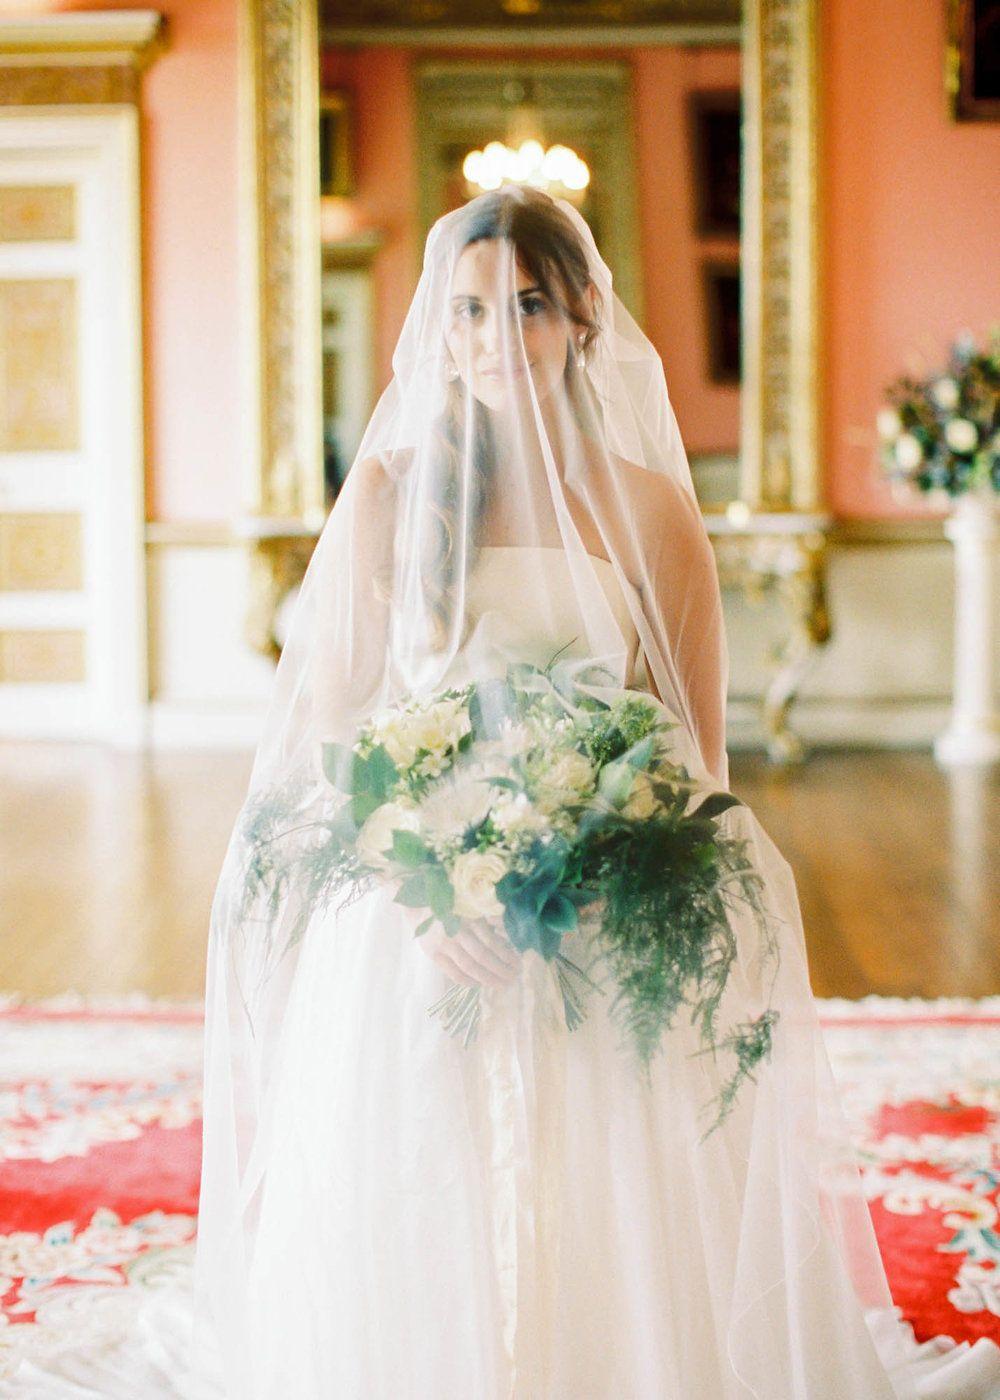 Amy O'Boyle Photography- Destination & UK Fine Art Film Wedding Photographer- Avington Park-43.jpg long veil over face (fuji 400h, pentax 645n)